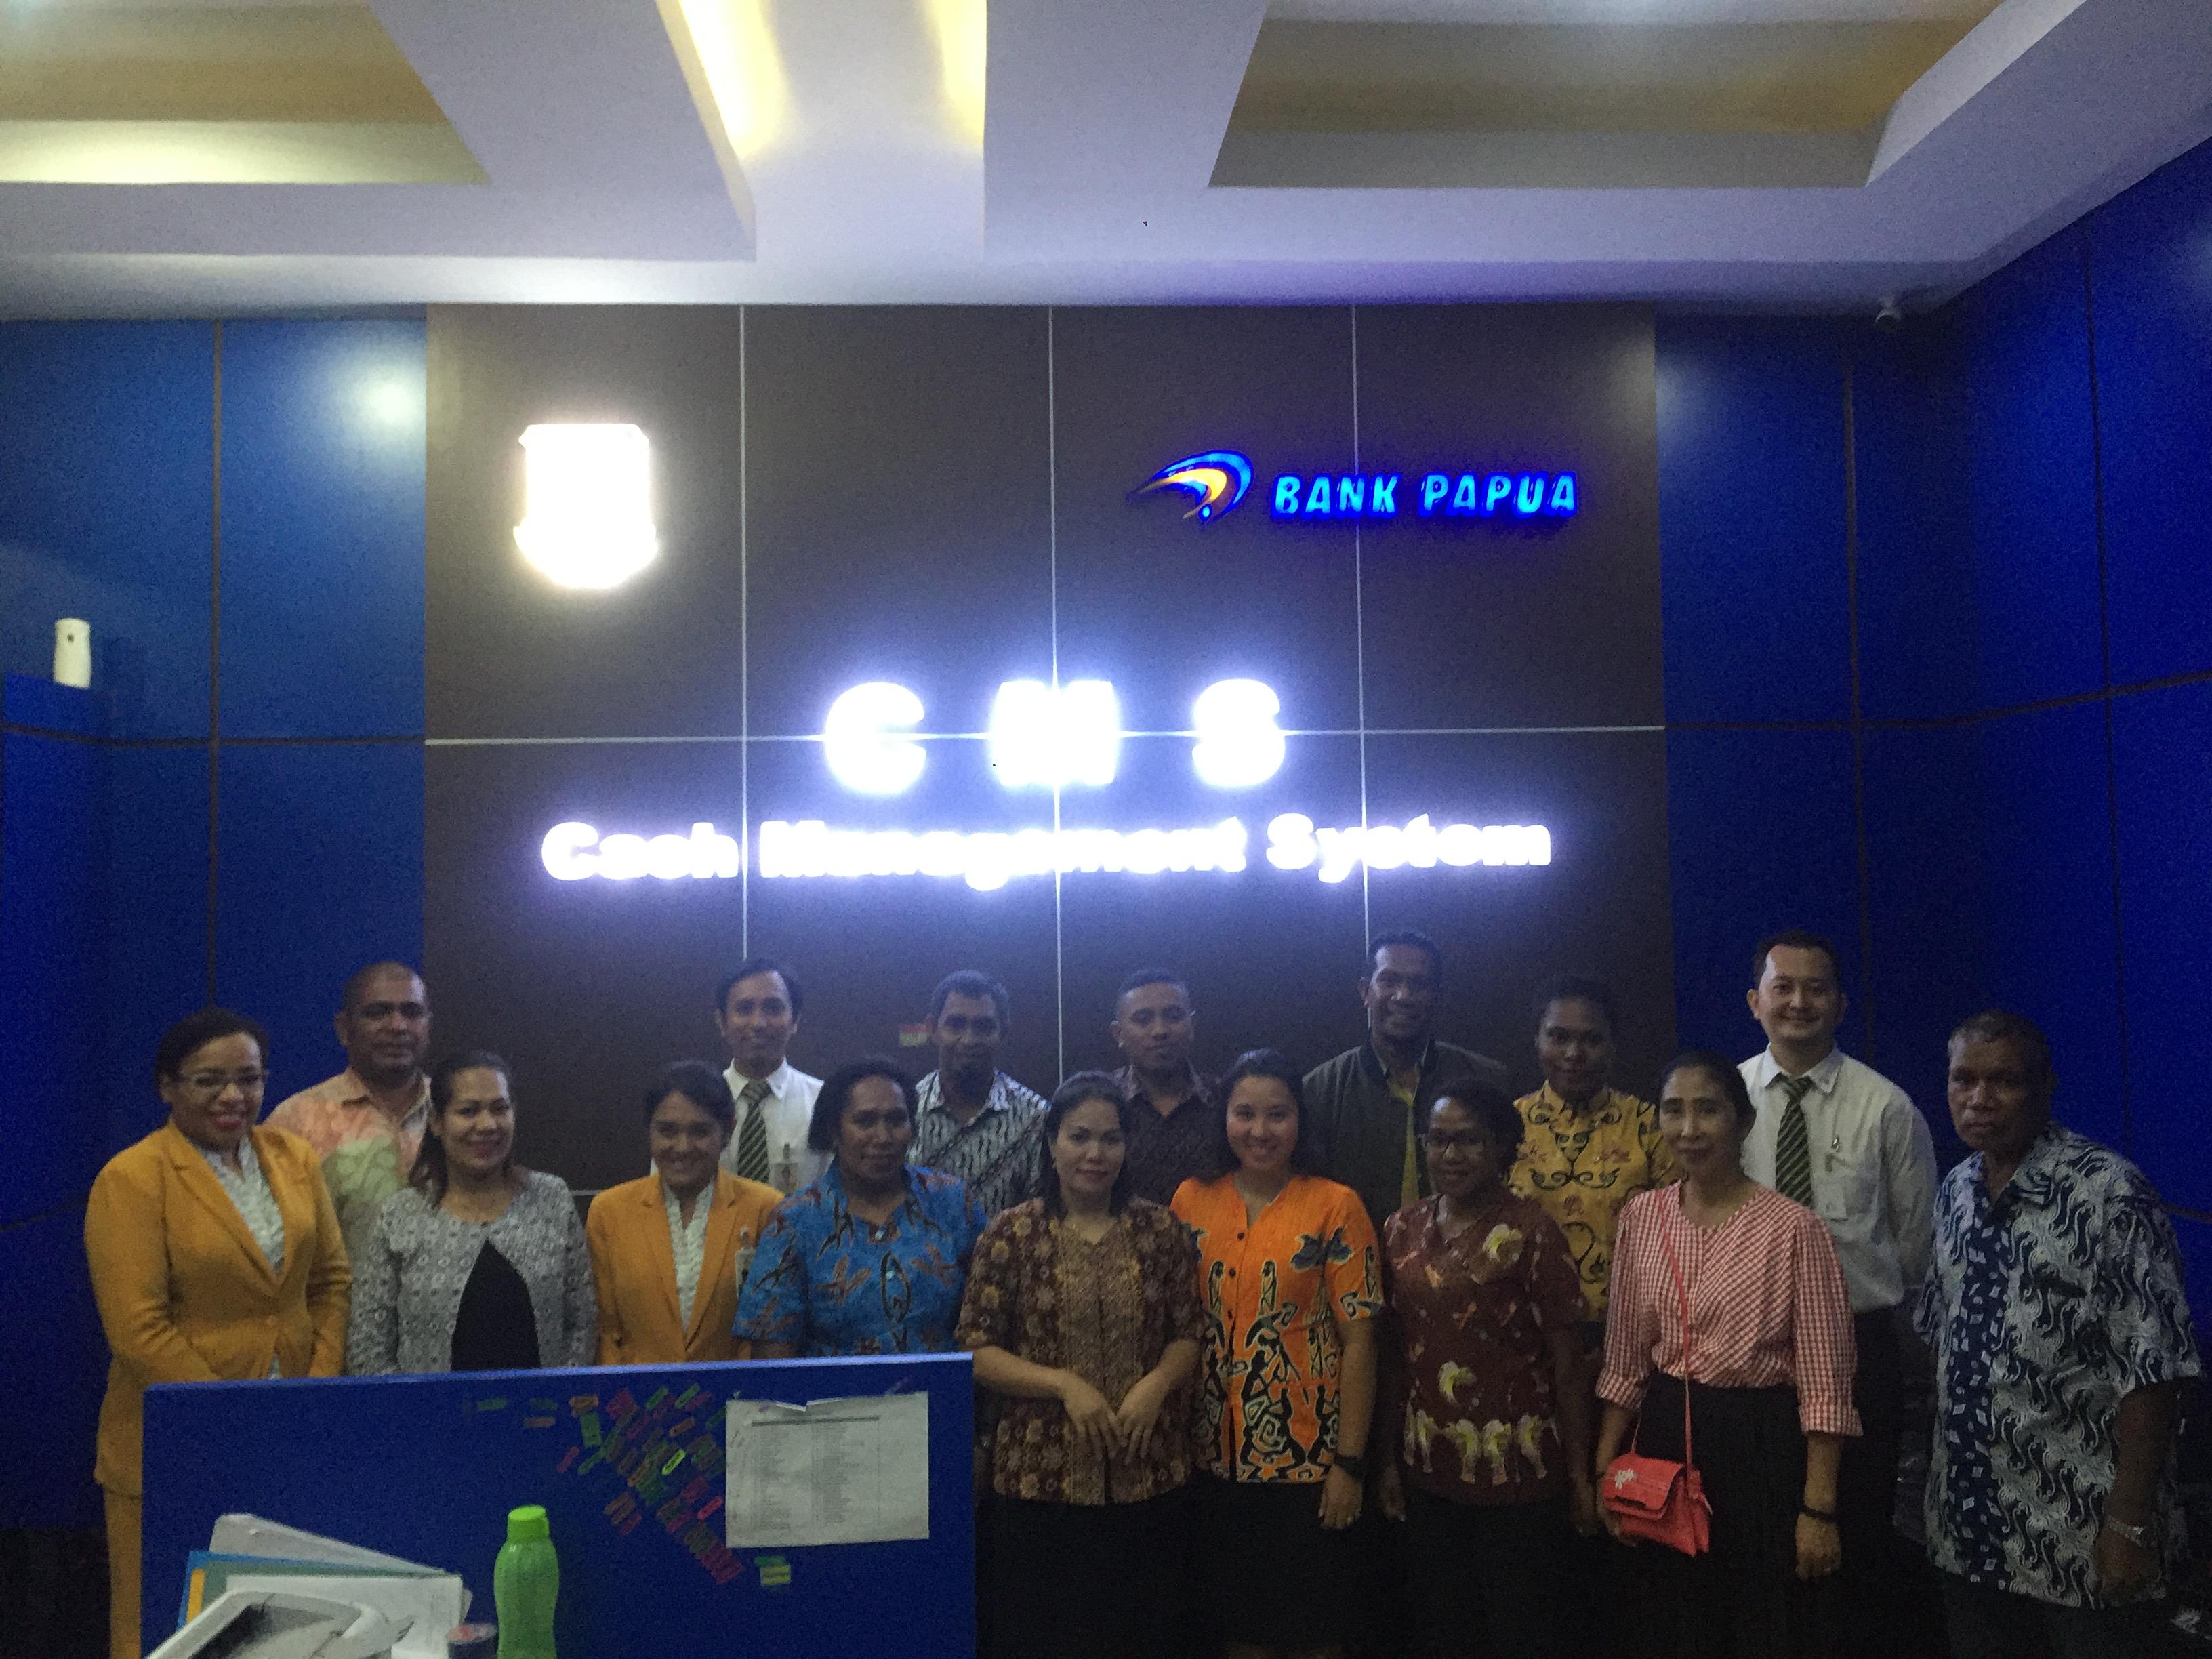 Menerima Kunjungan BPKAD Kab.MIMIKA Tahun 2018